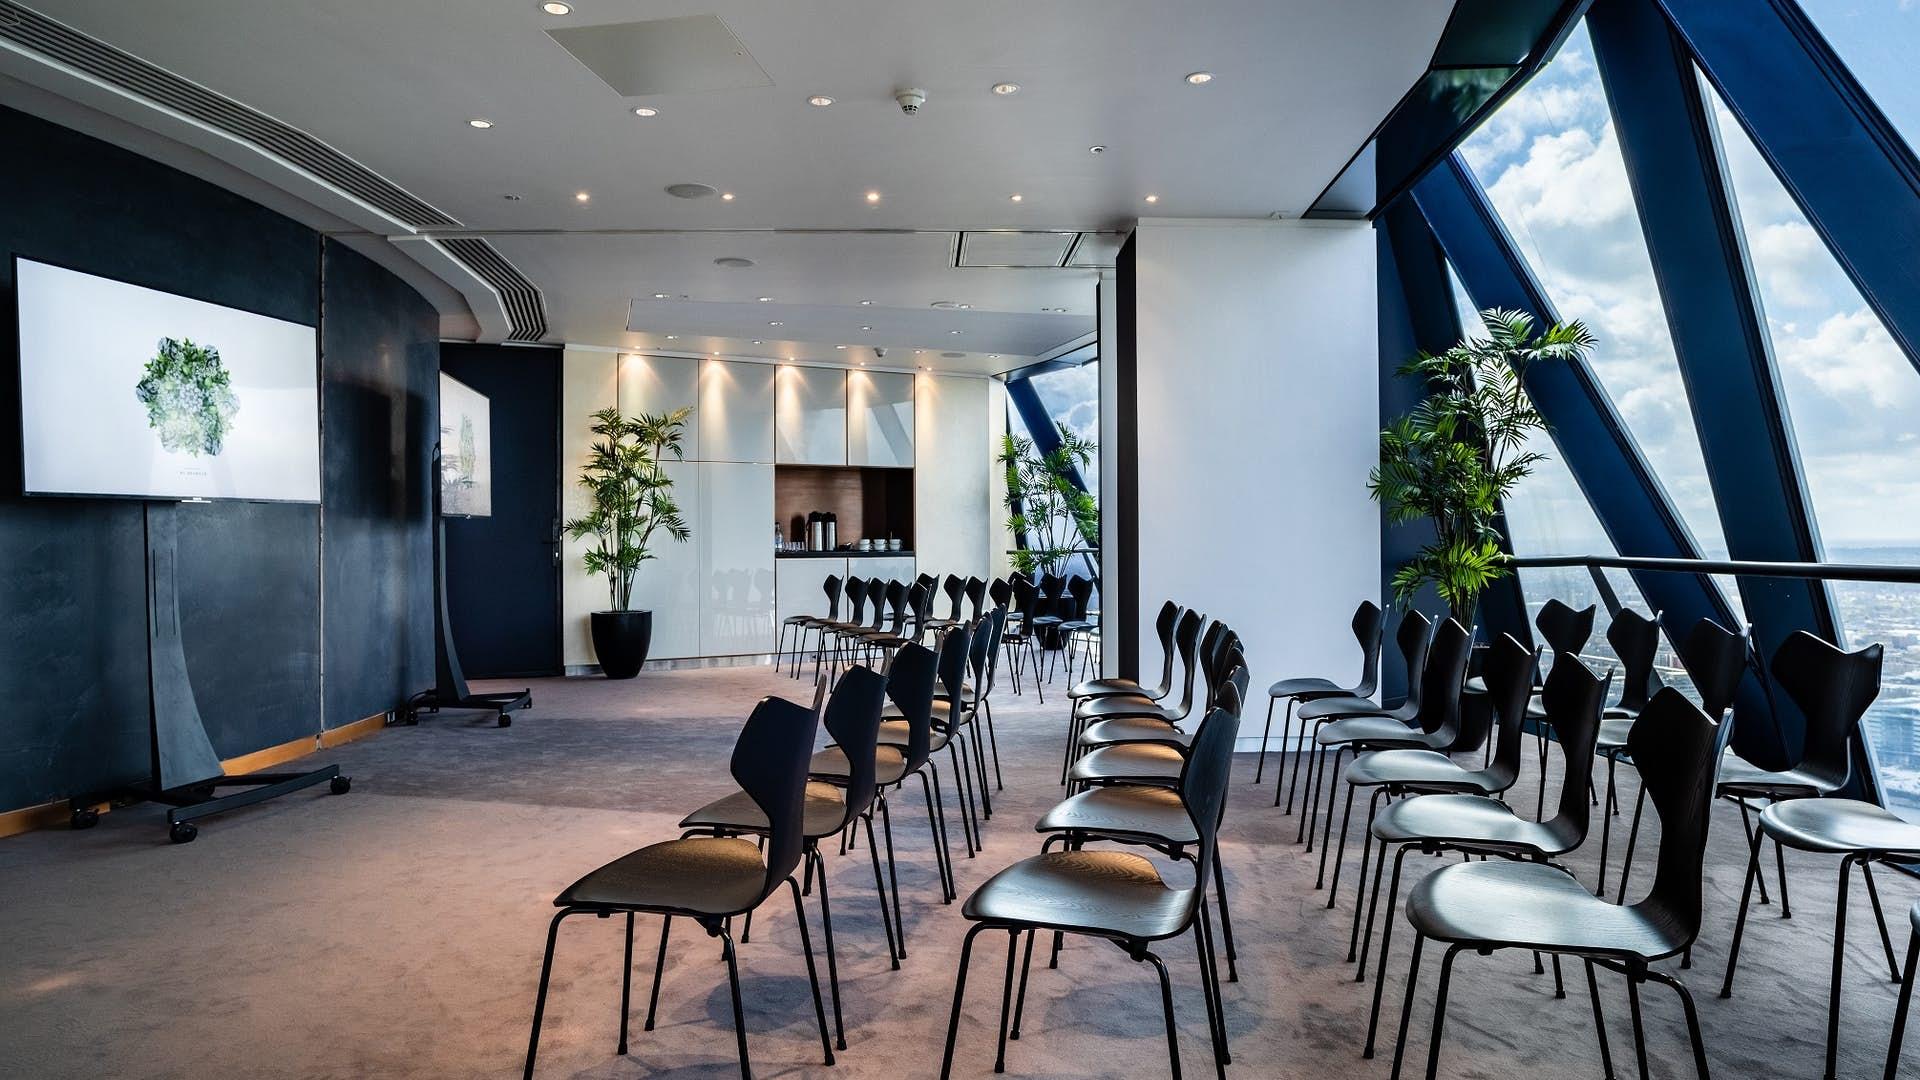 Meeting room in The Gherkin